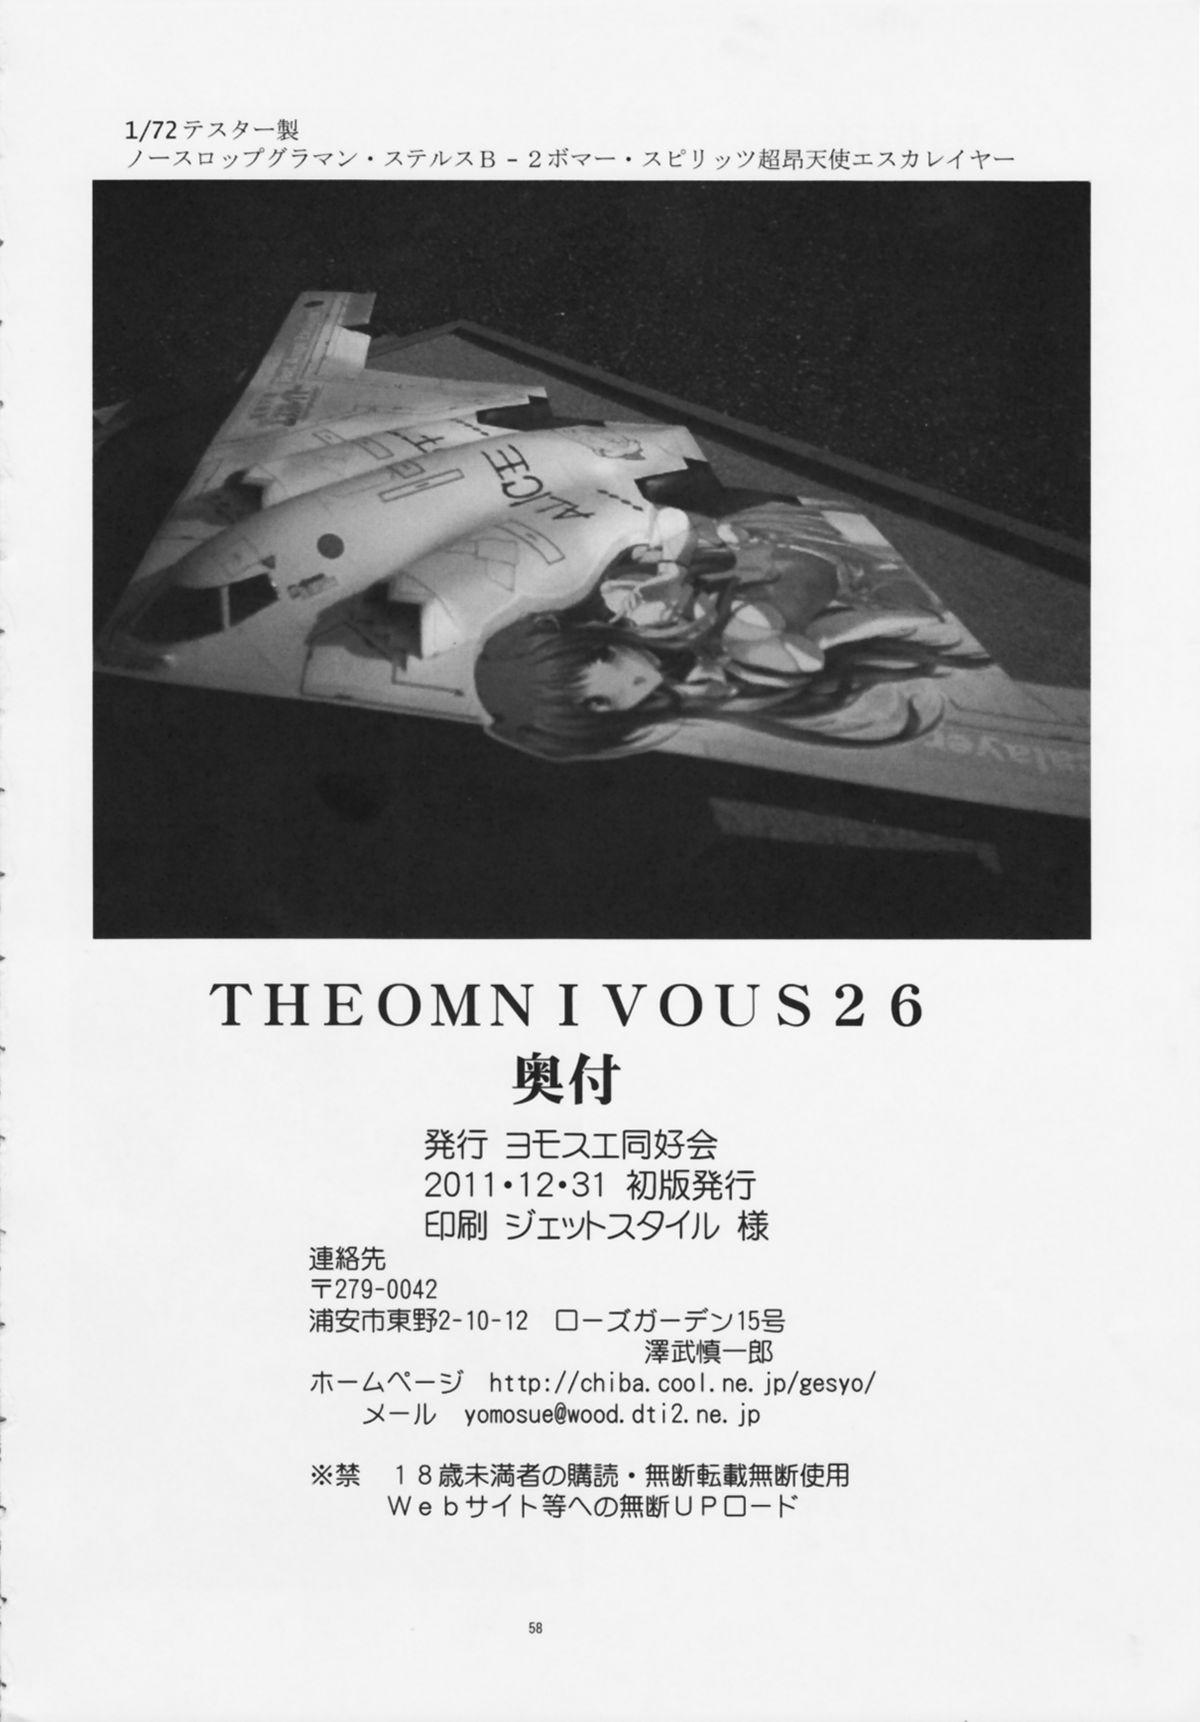 THE OMNIVOUS 26 57